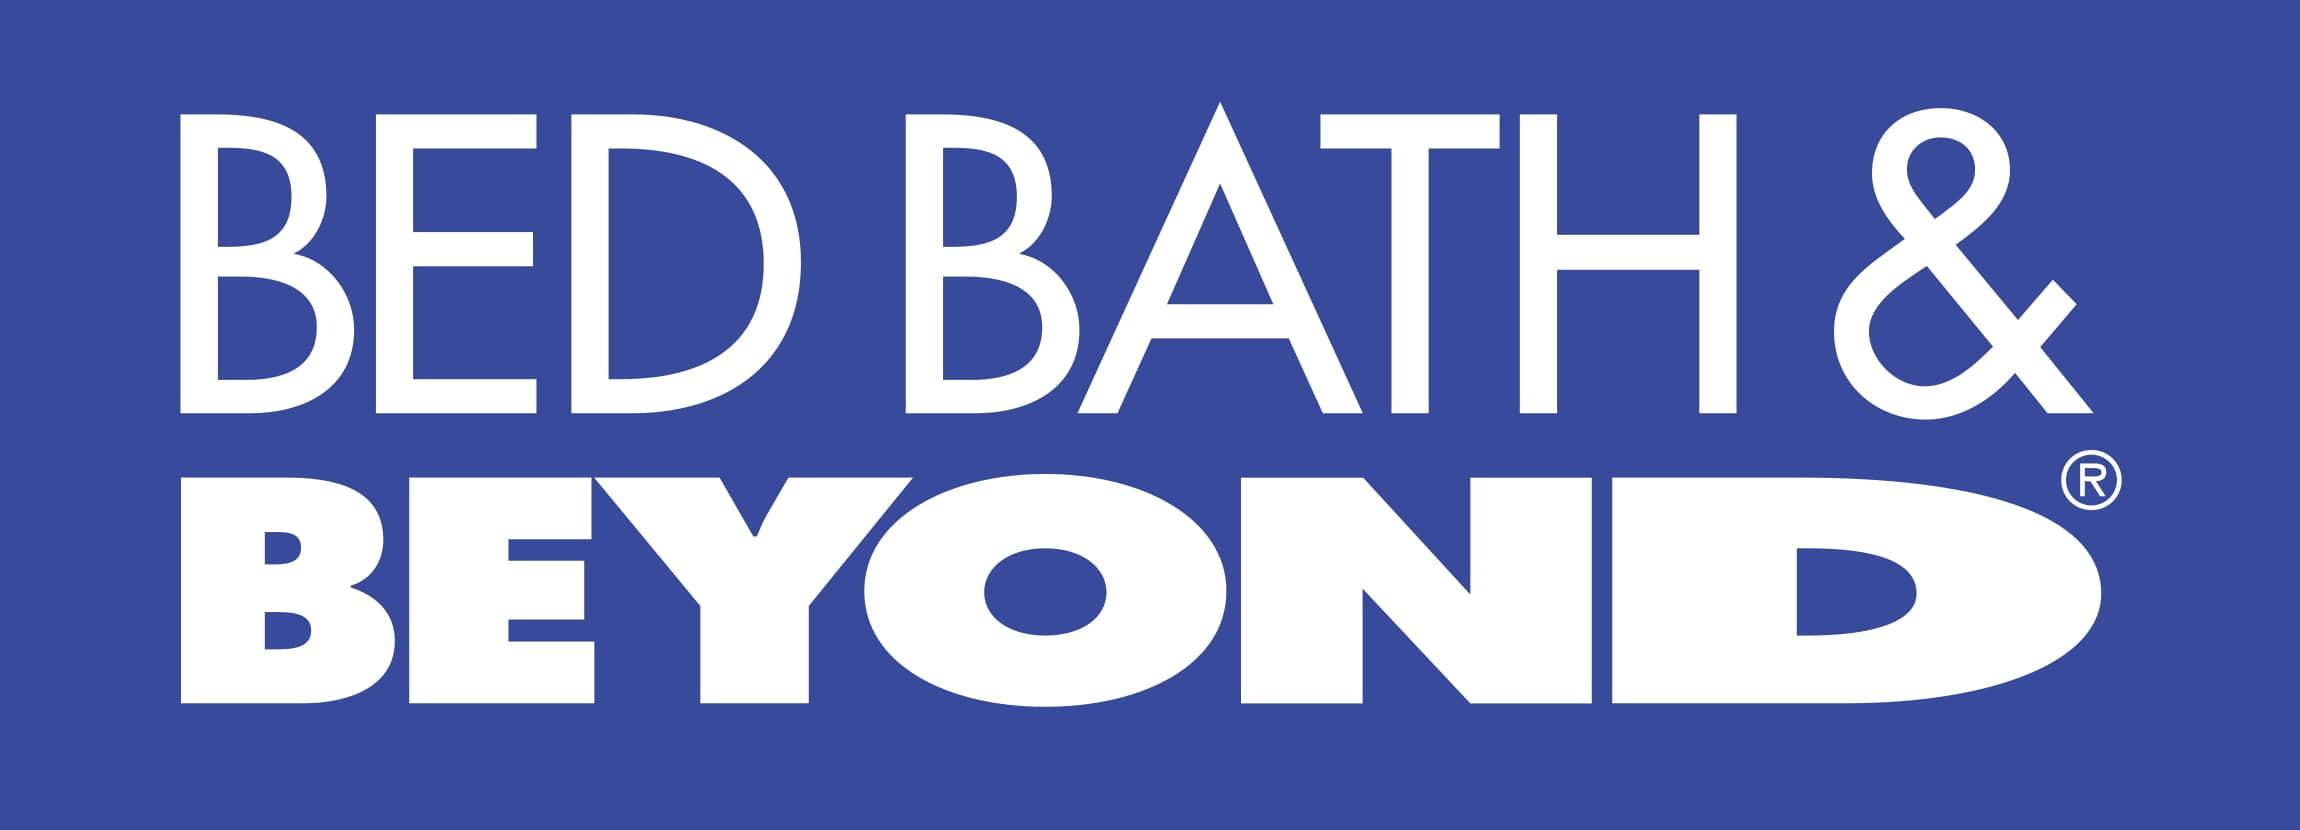 Bed Bath Beyond Online S Increase